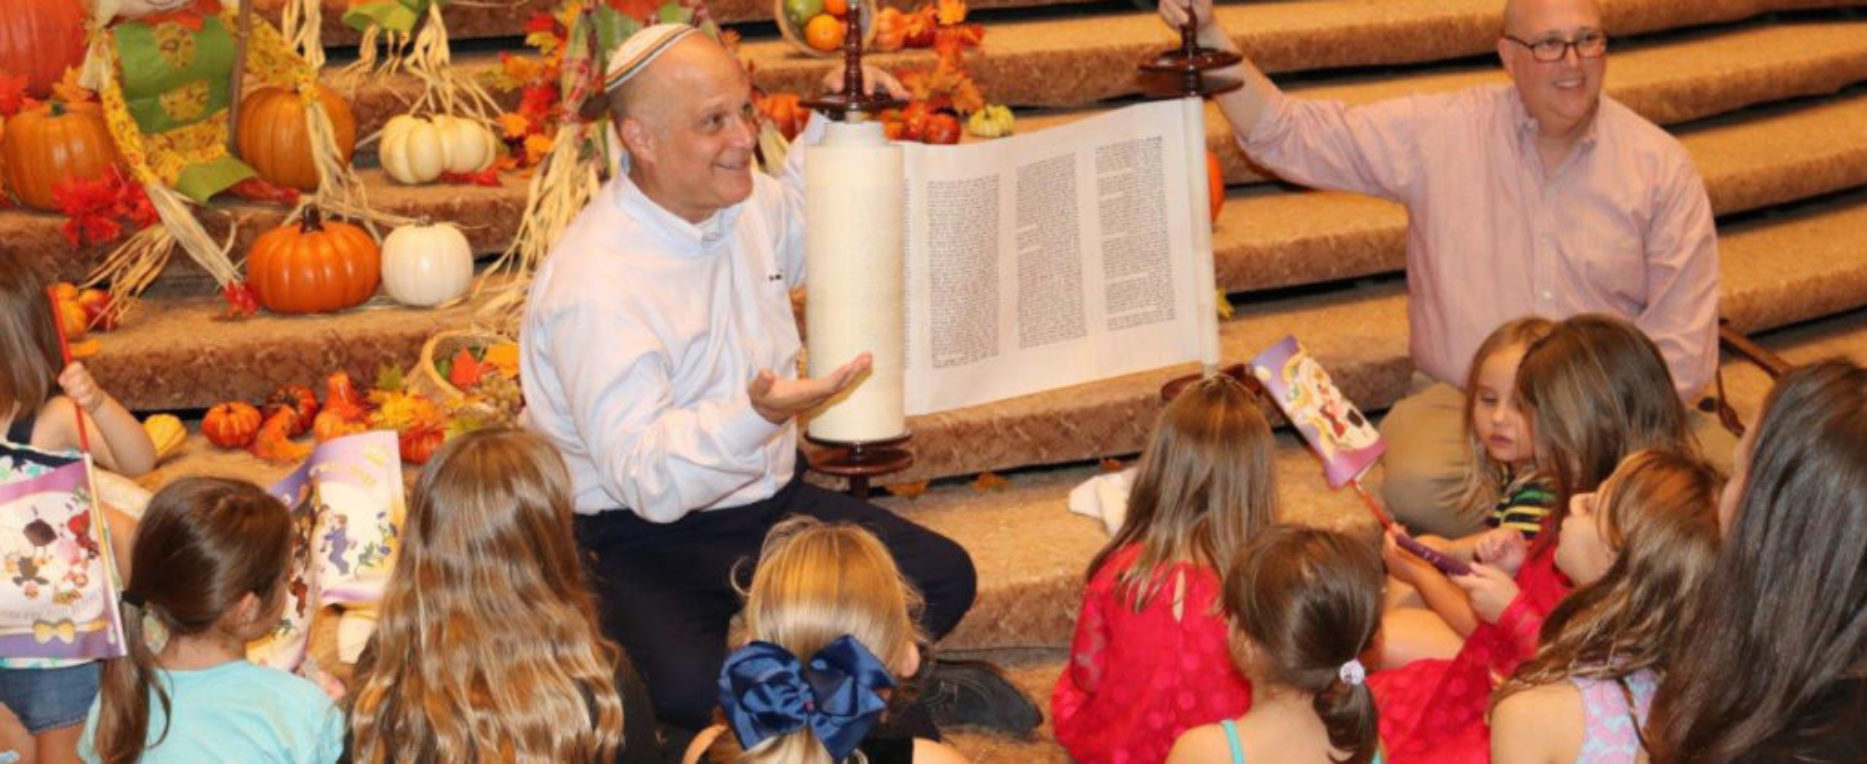 Simchat Torah Paley kids 2019 website